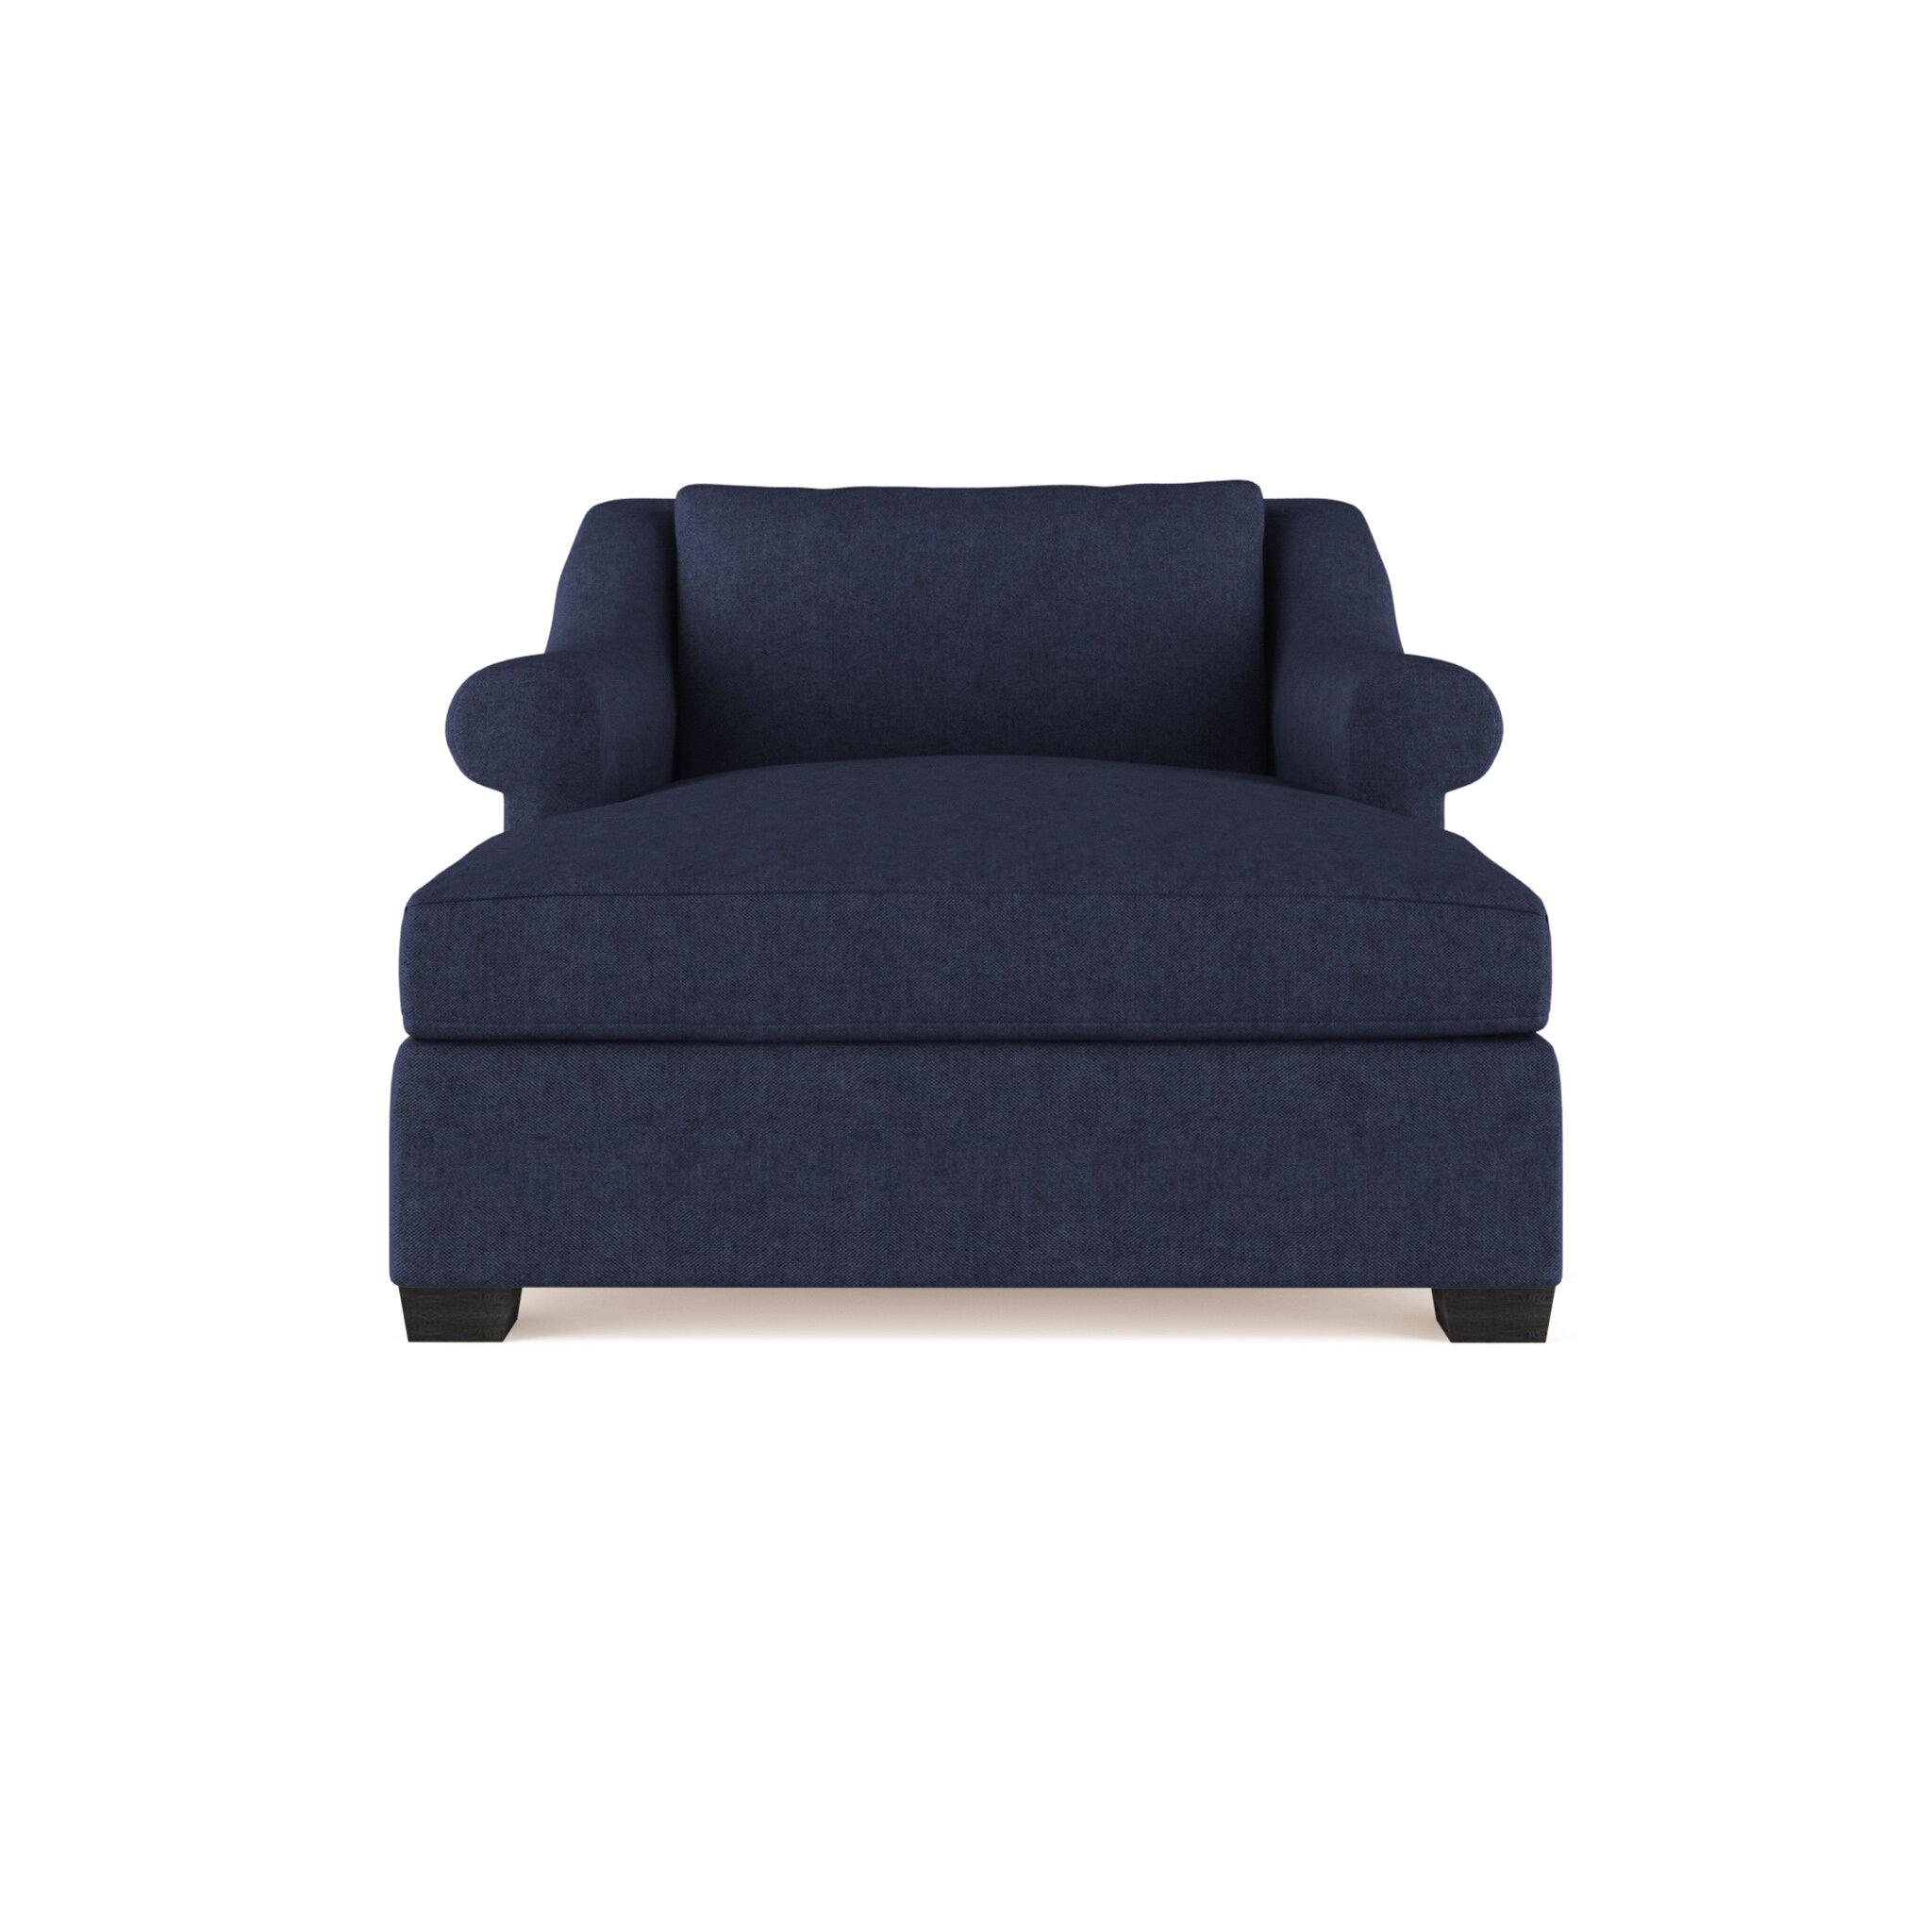 Canora Grey Auberge Velvet Chaise Lounge Wayfair Ca